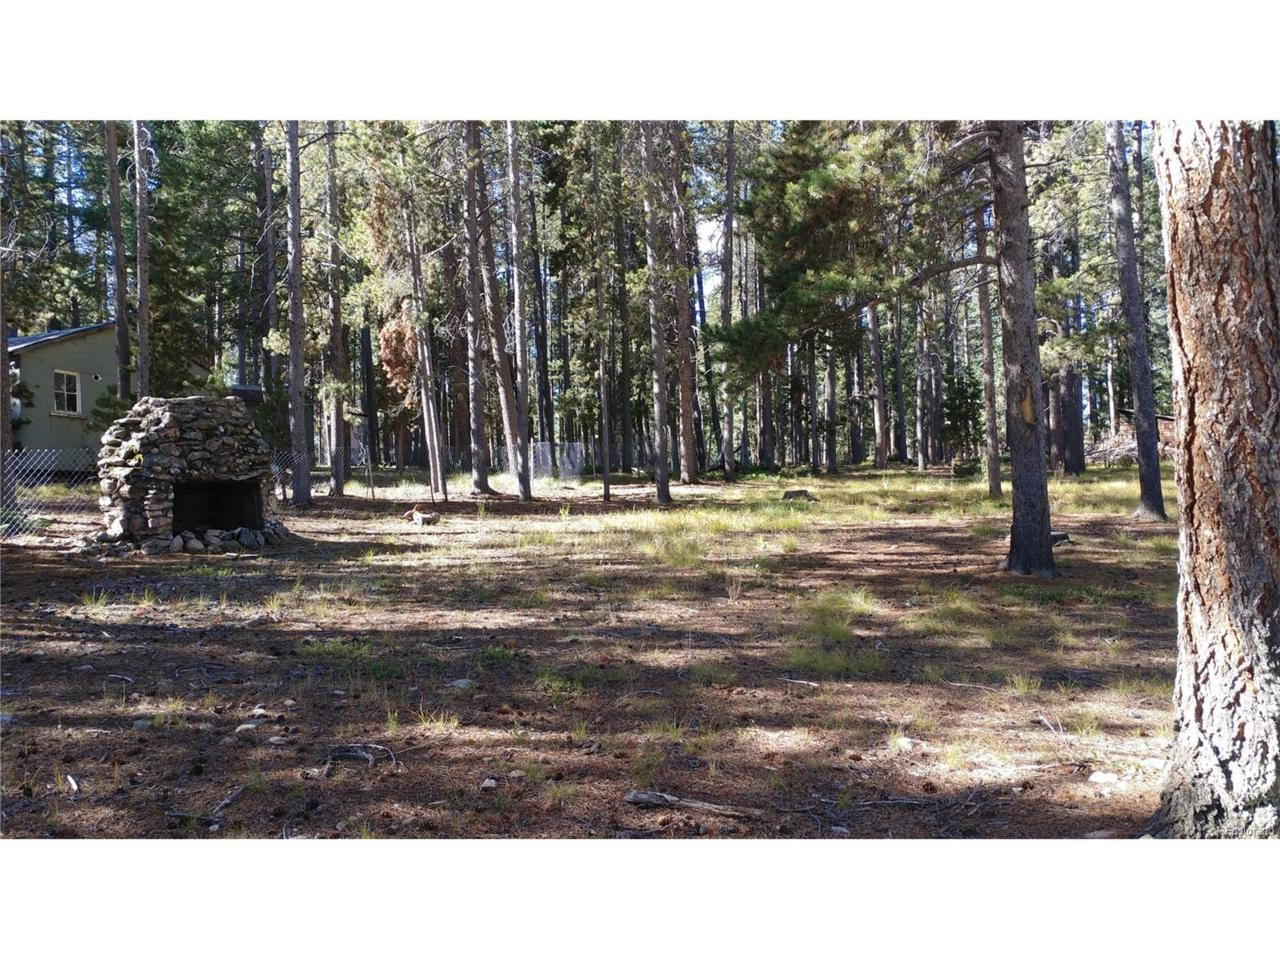 10947 Goodheart Avenue, Conifer, CO 80433 (MLS #2448032) :: 8z Real Estate